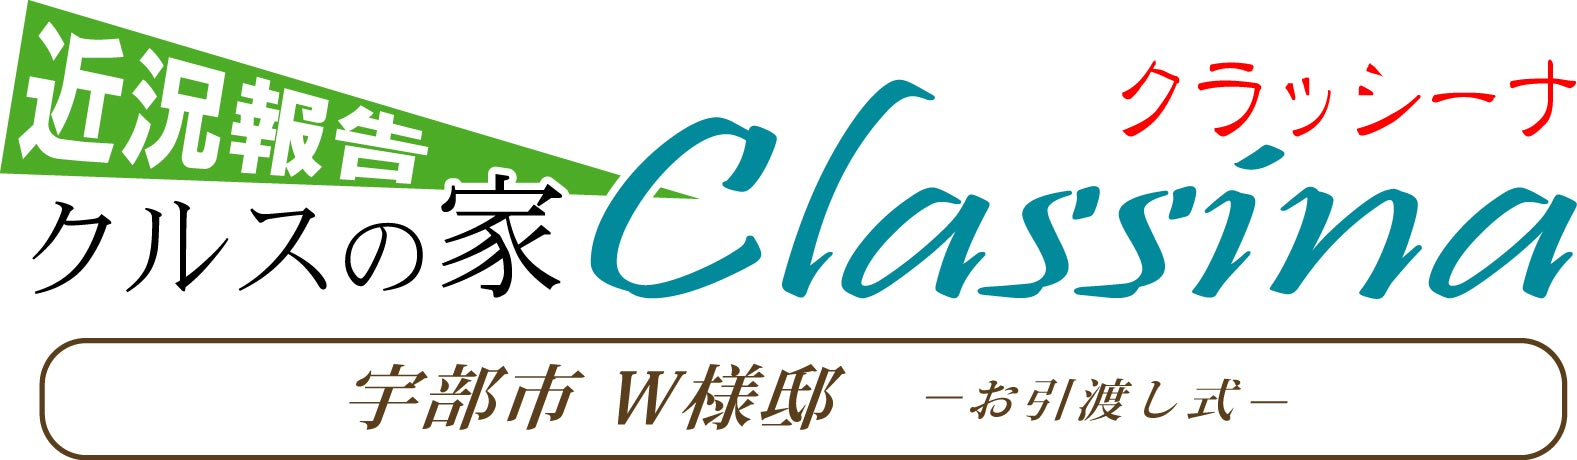 KuraSi-natu-sin74-04.jpg